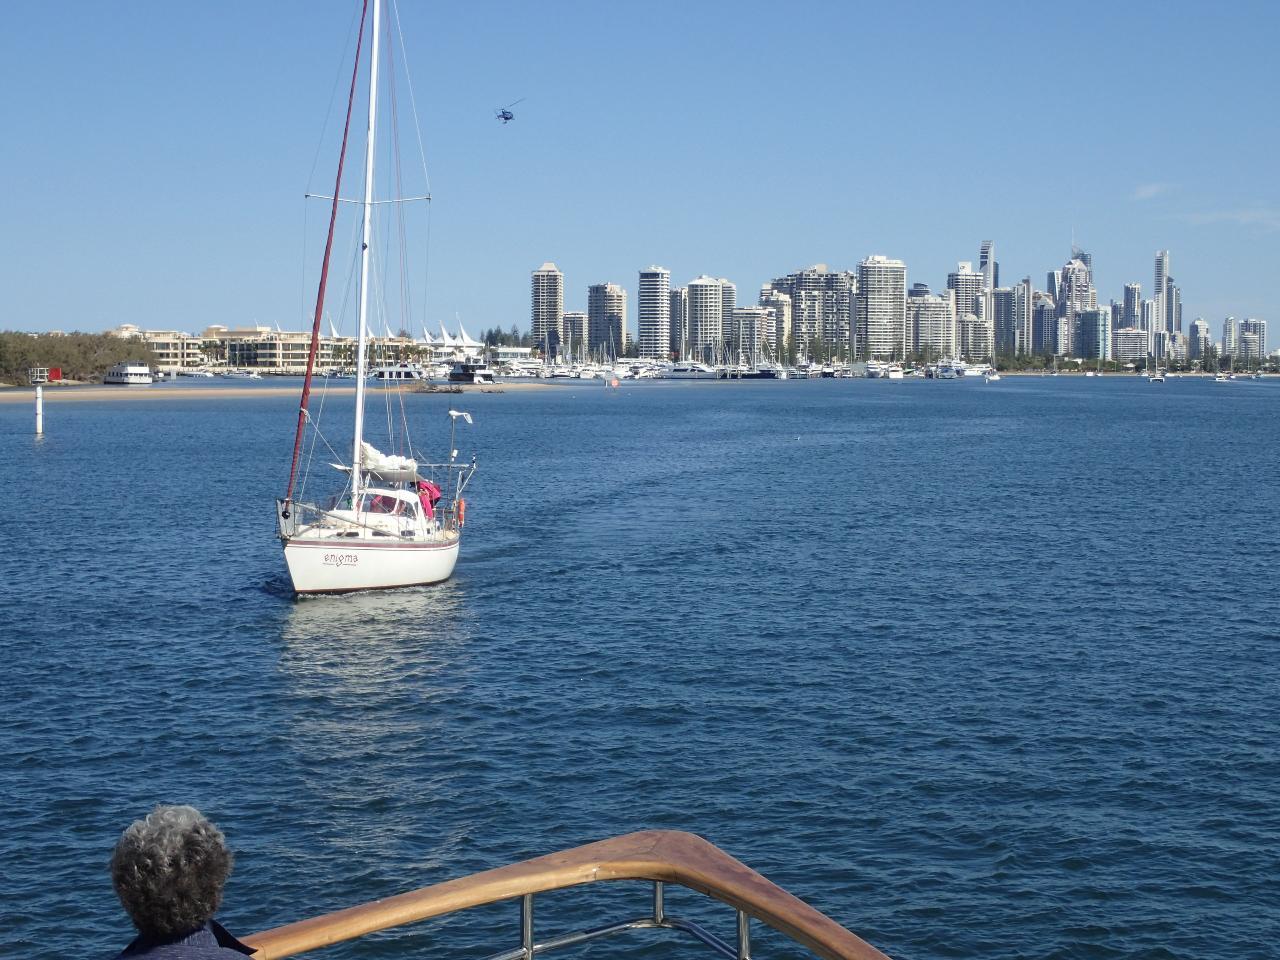 Gold Coast to Brisbane 300 Islands, sheltered water cruise